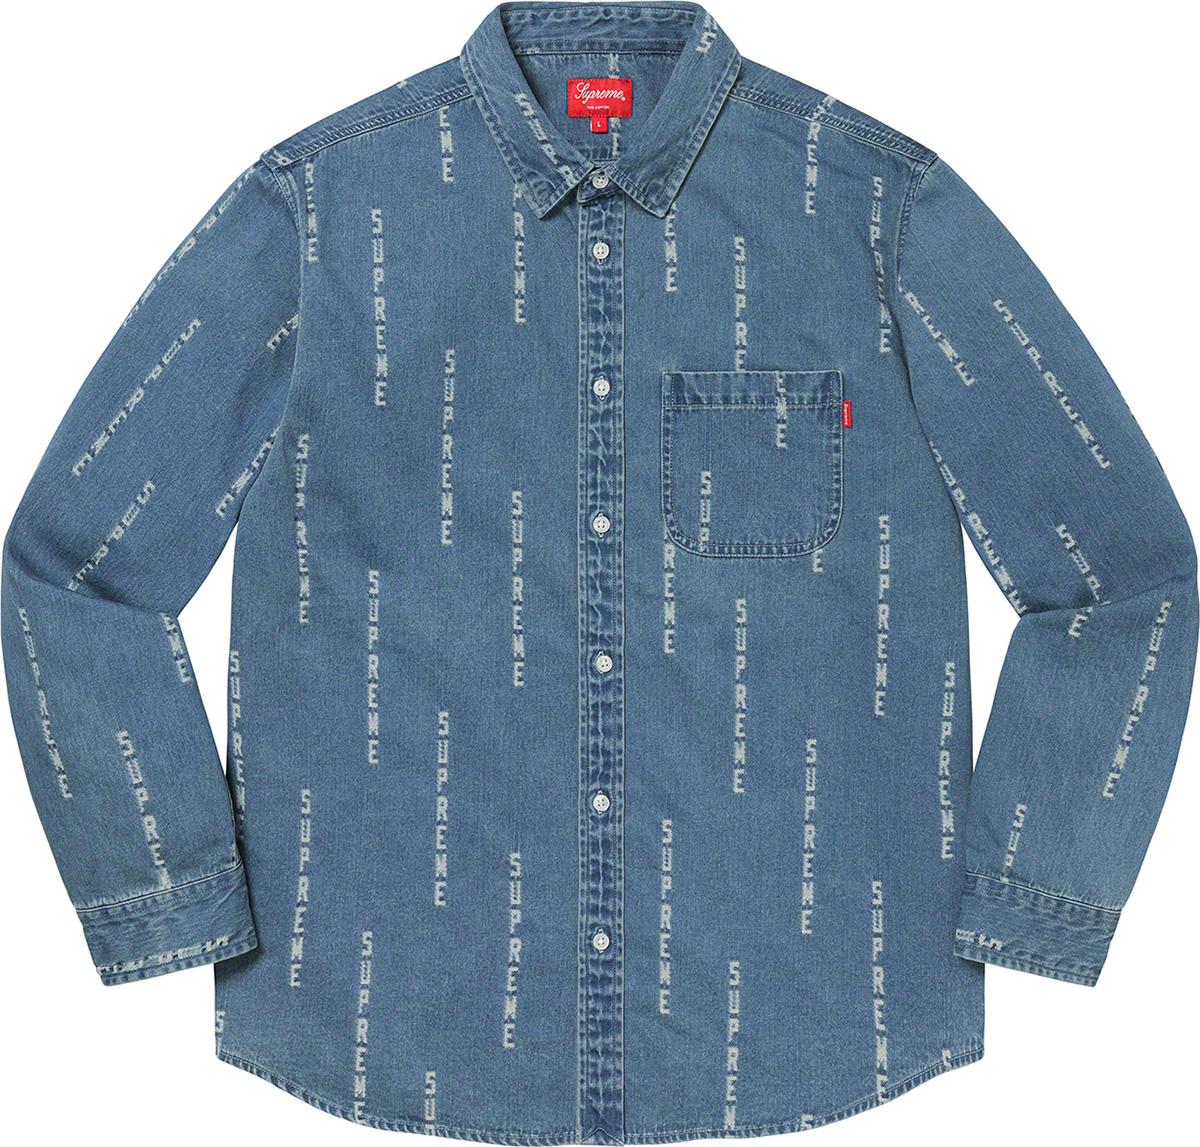 Supreme 2020fw Logo Stripe Jacquard Denim Shirt シュプリーム デニム シャツ ブルー